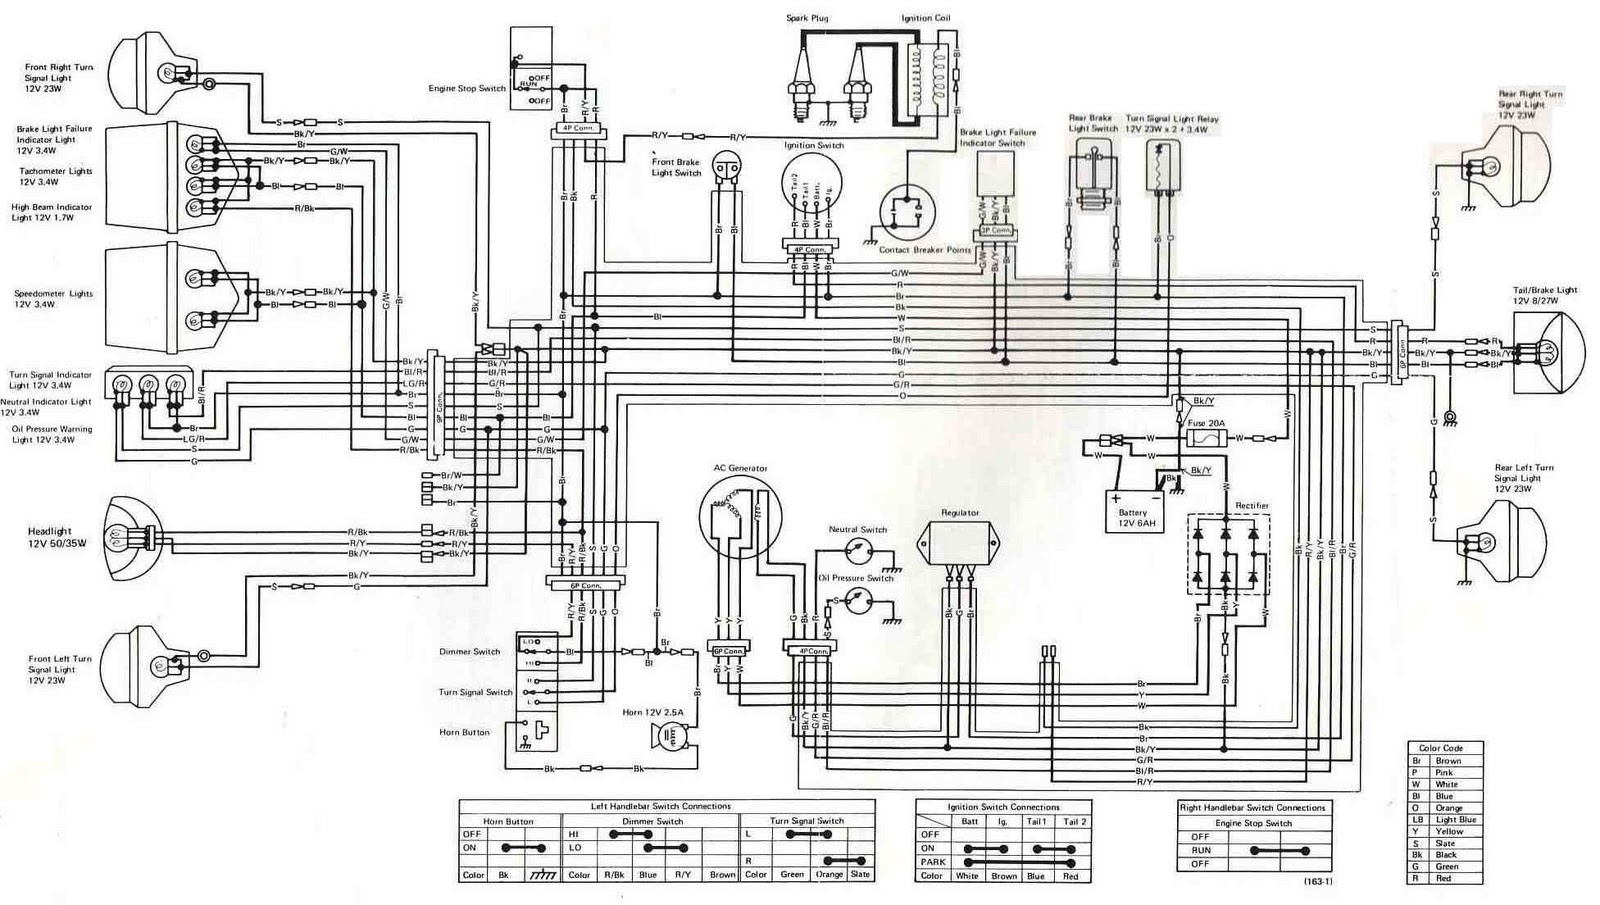 Kawasaki KLT 200 Wiring Diagram | All about Wiring Diagrams